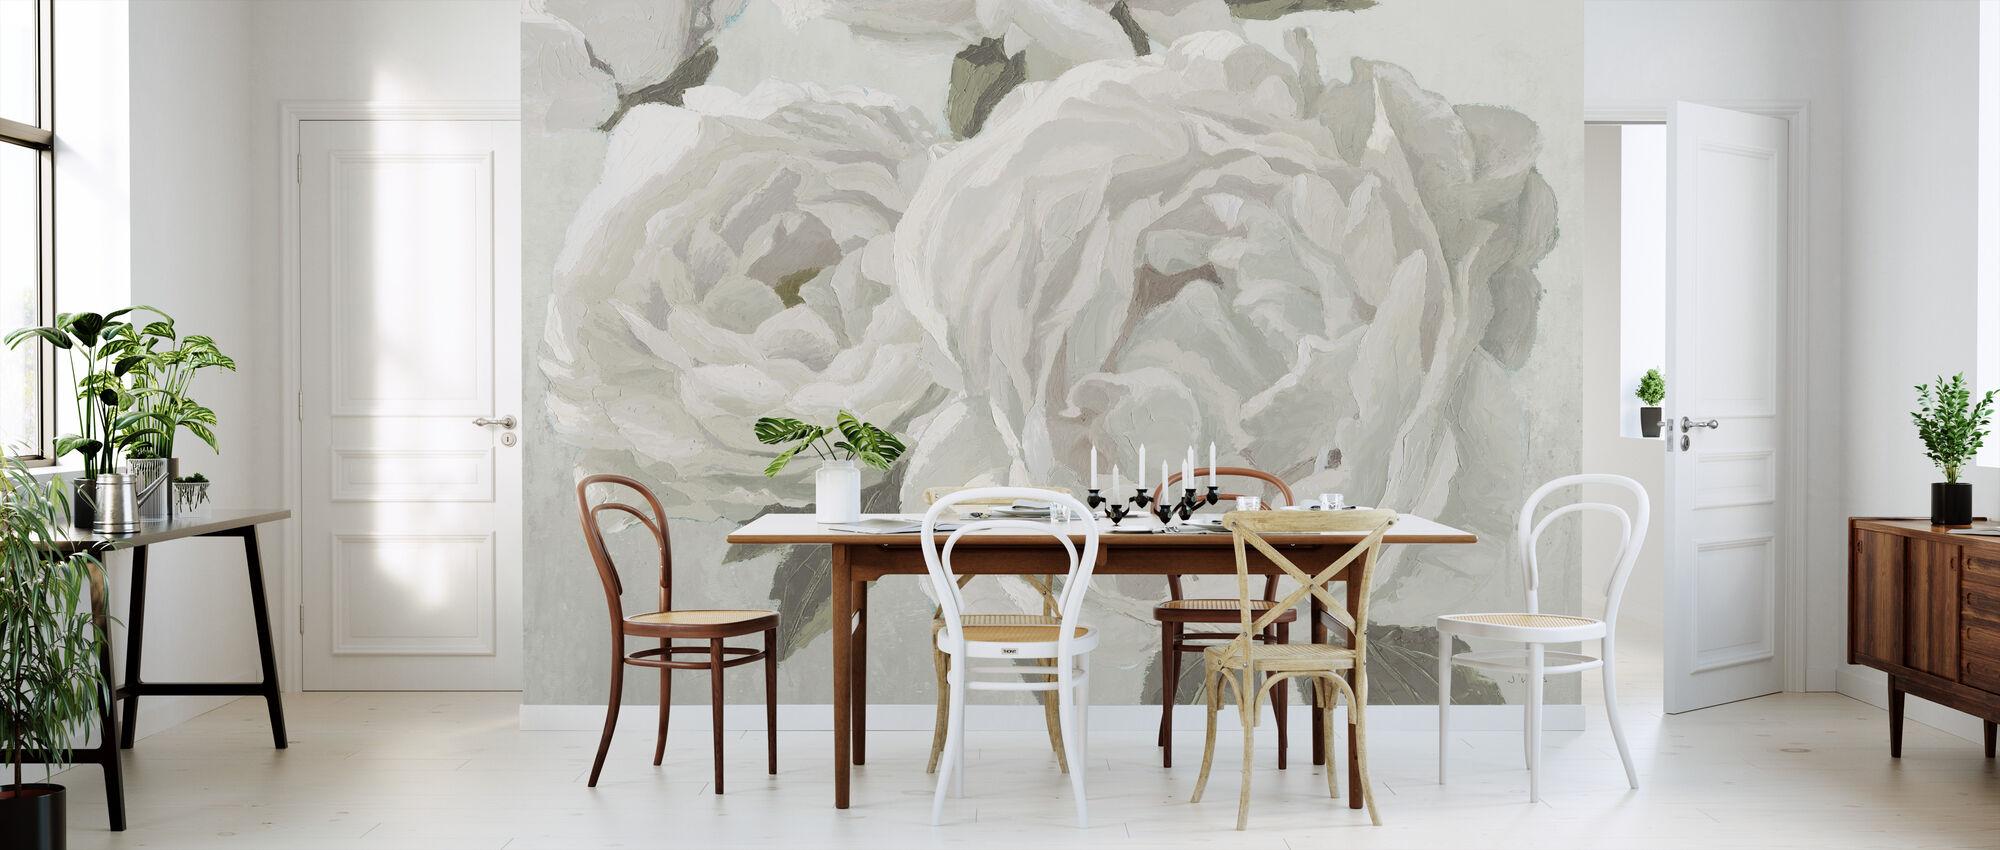 Essence of June - Wallpaper - Kitchen